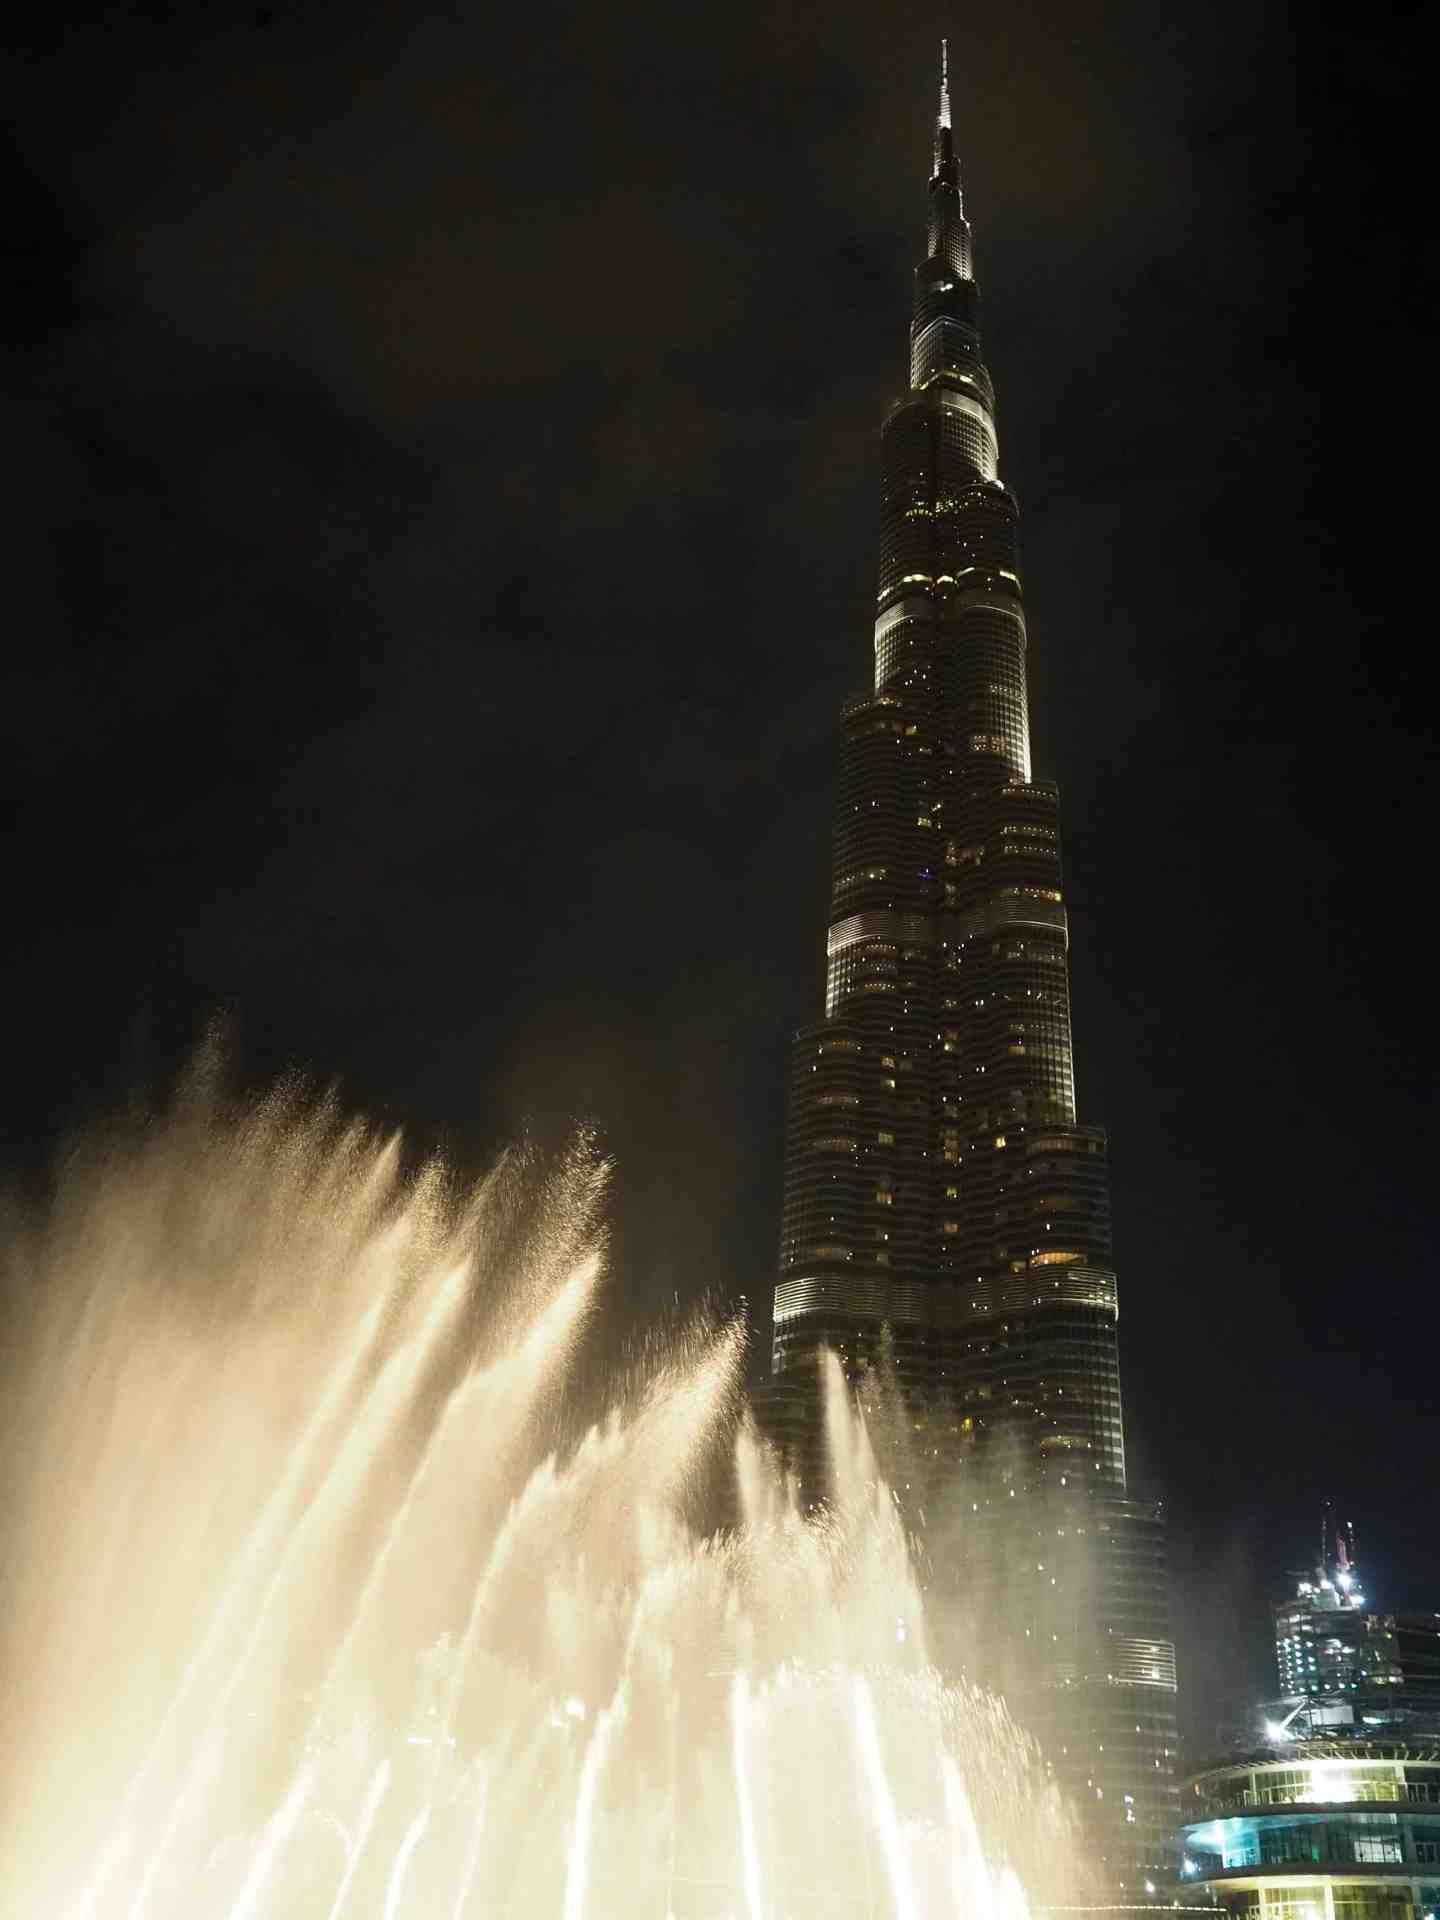 burj khalifa dubai fountain show